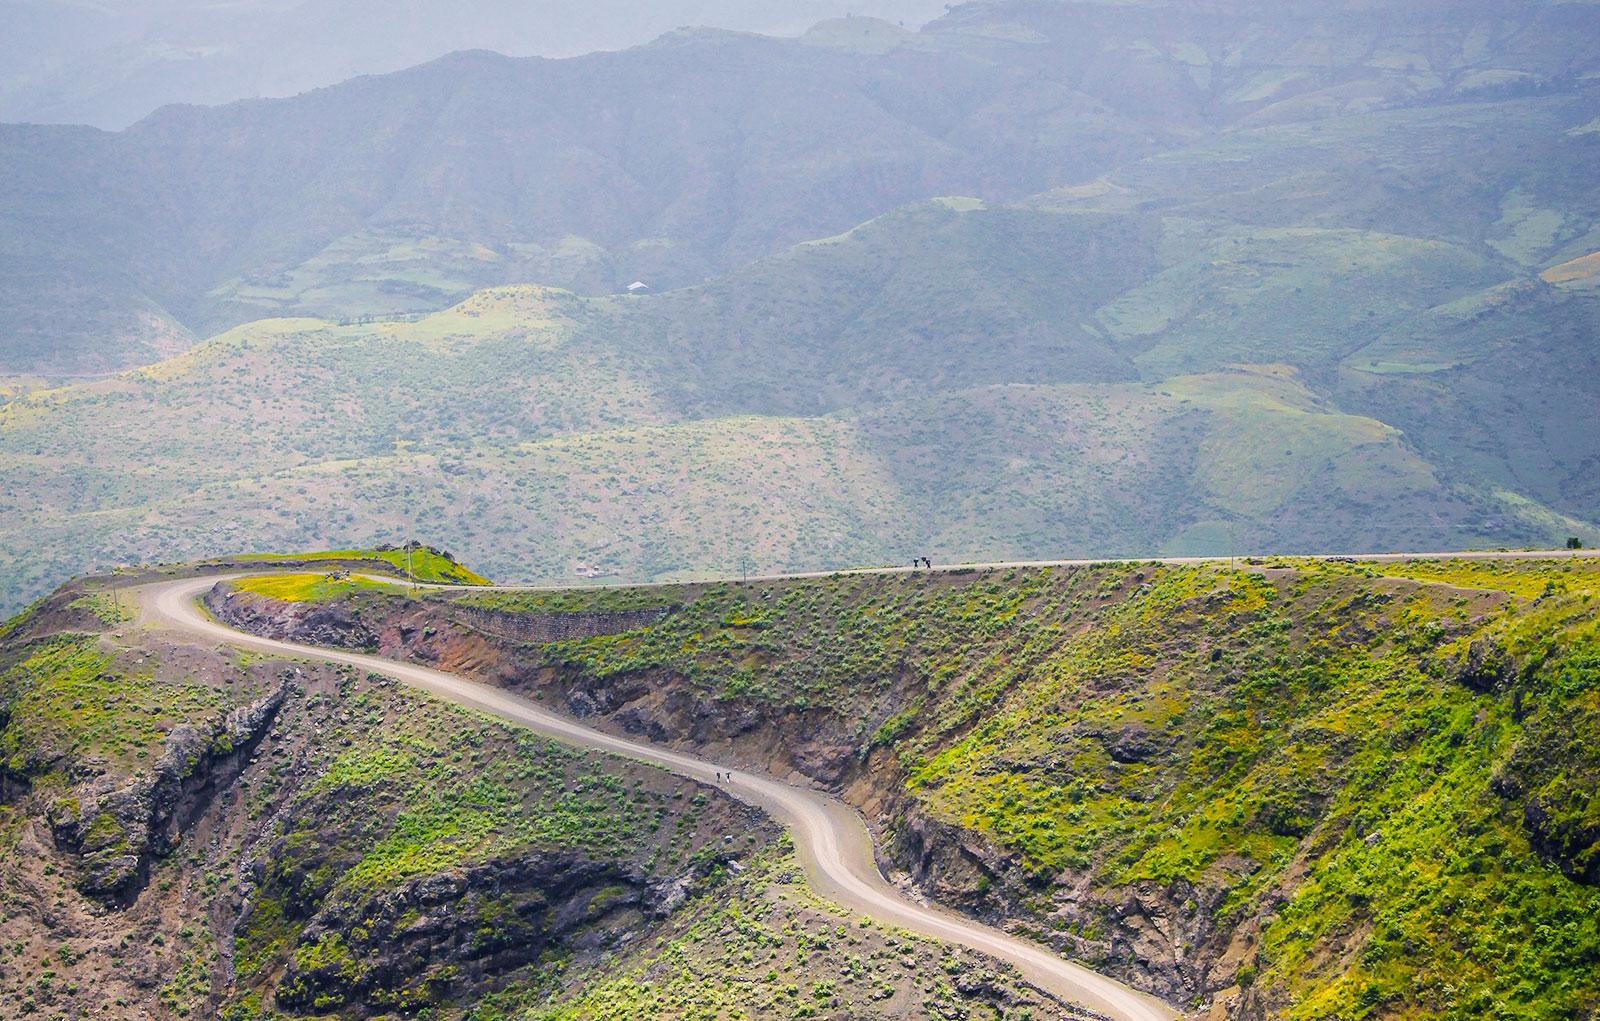 Trekking In The Ethiopian Mountains